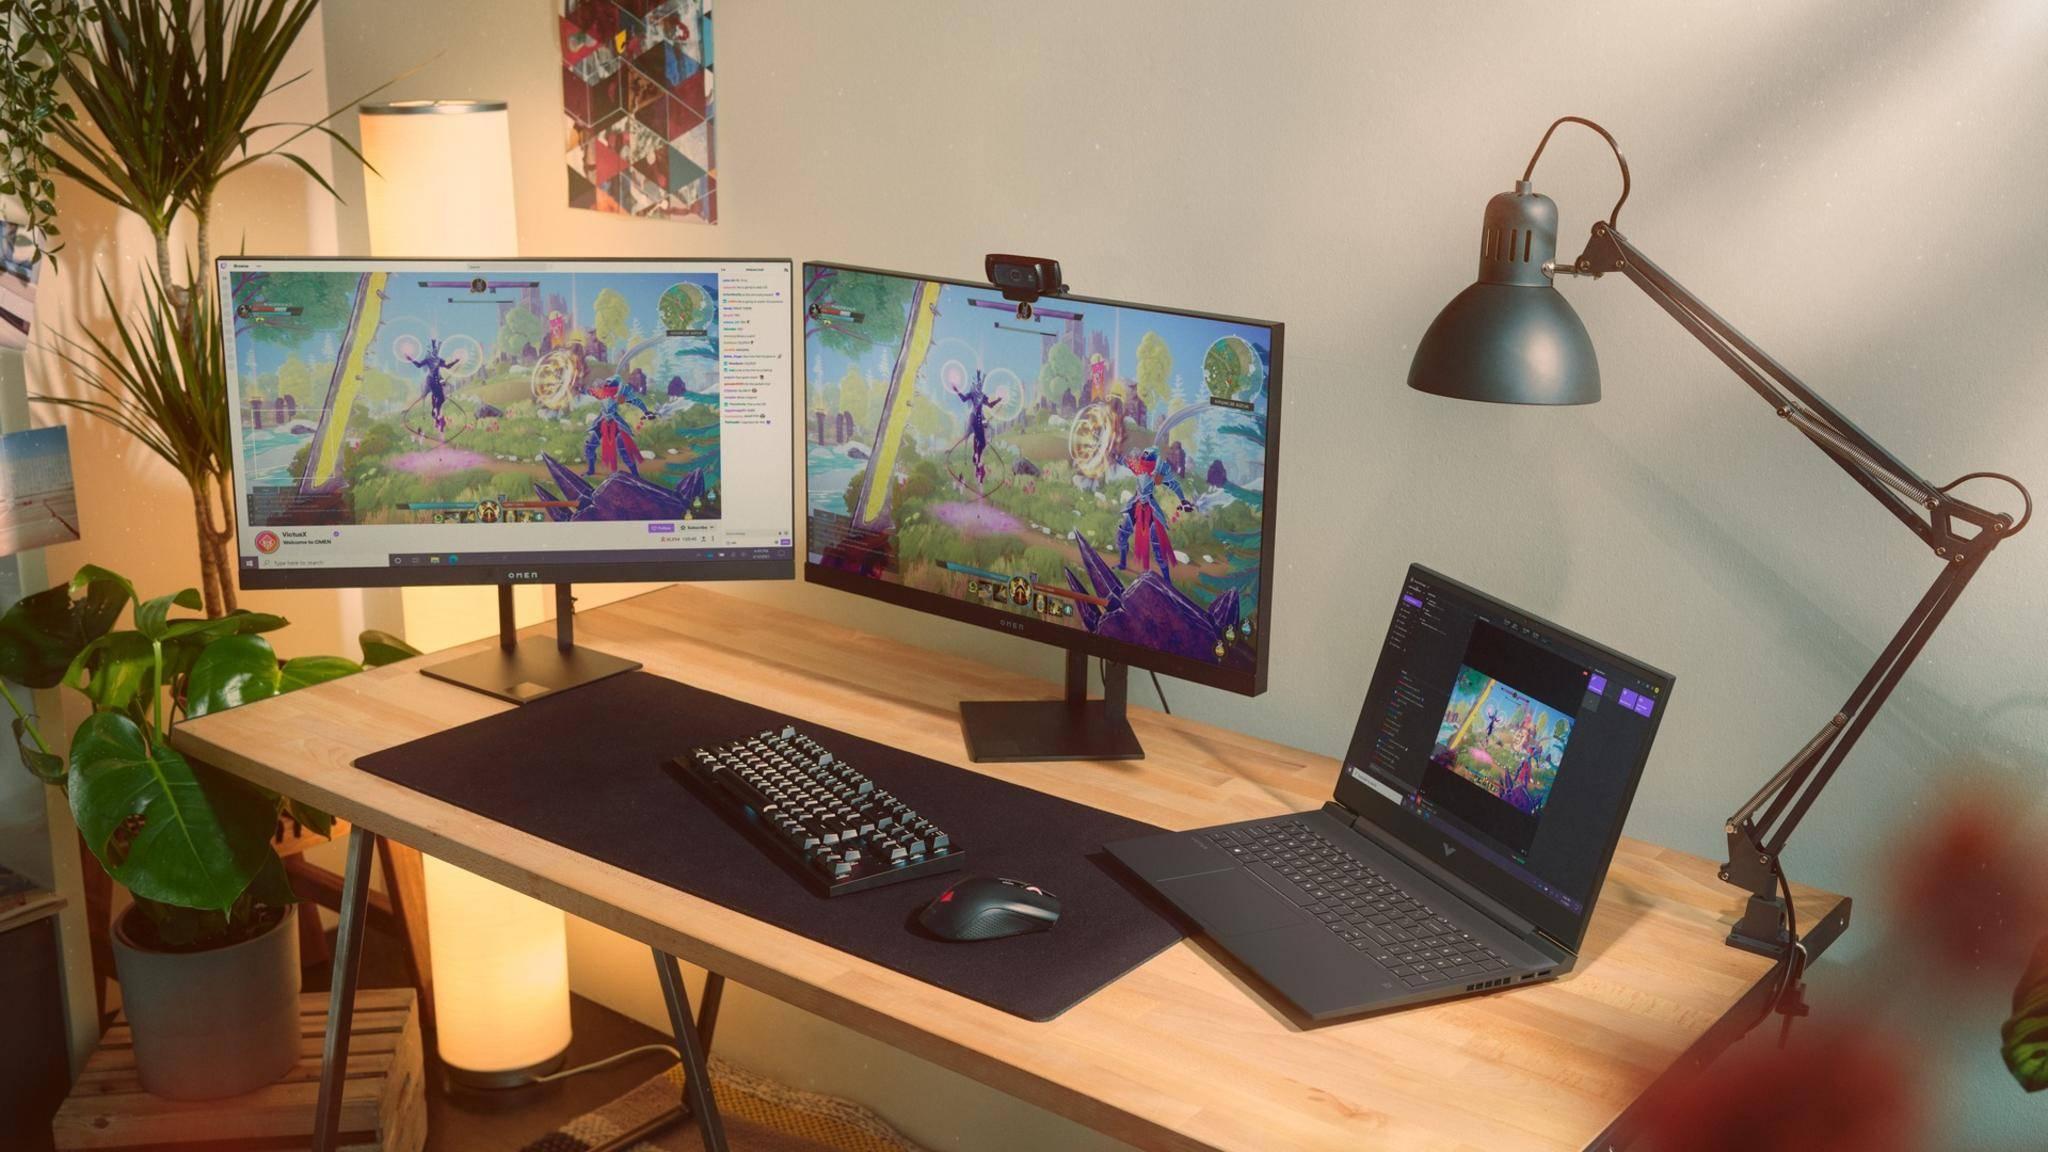 Victus-HP-16-1-gaming-laptop-notebook